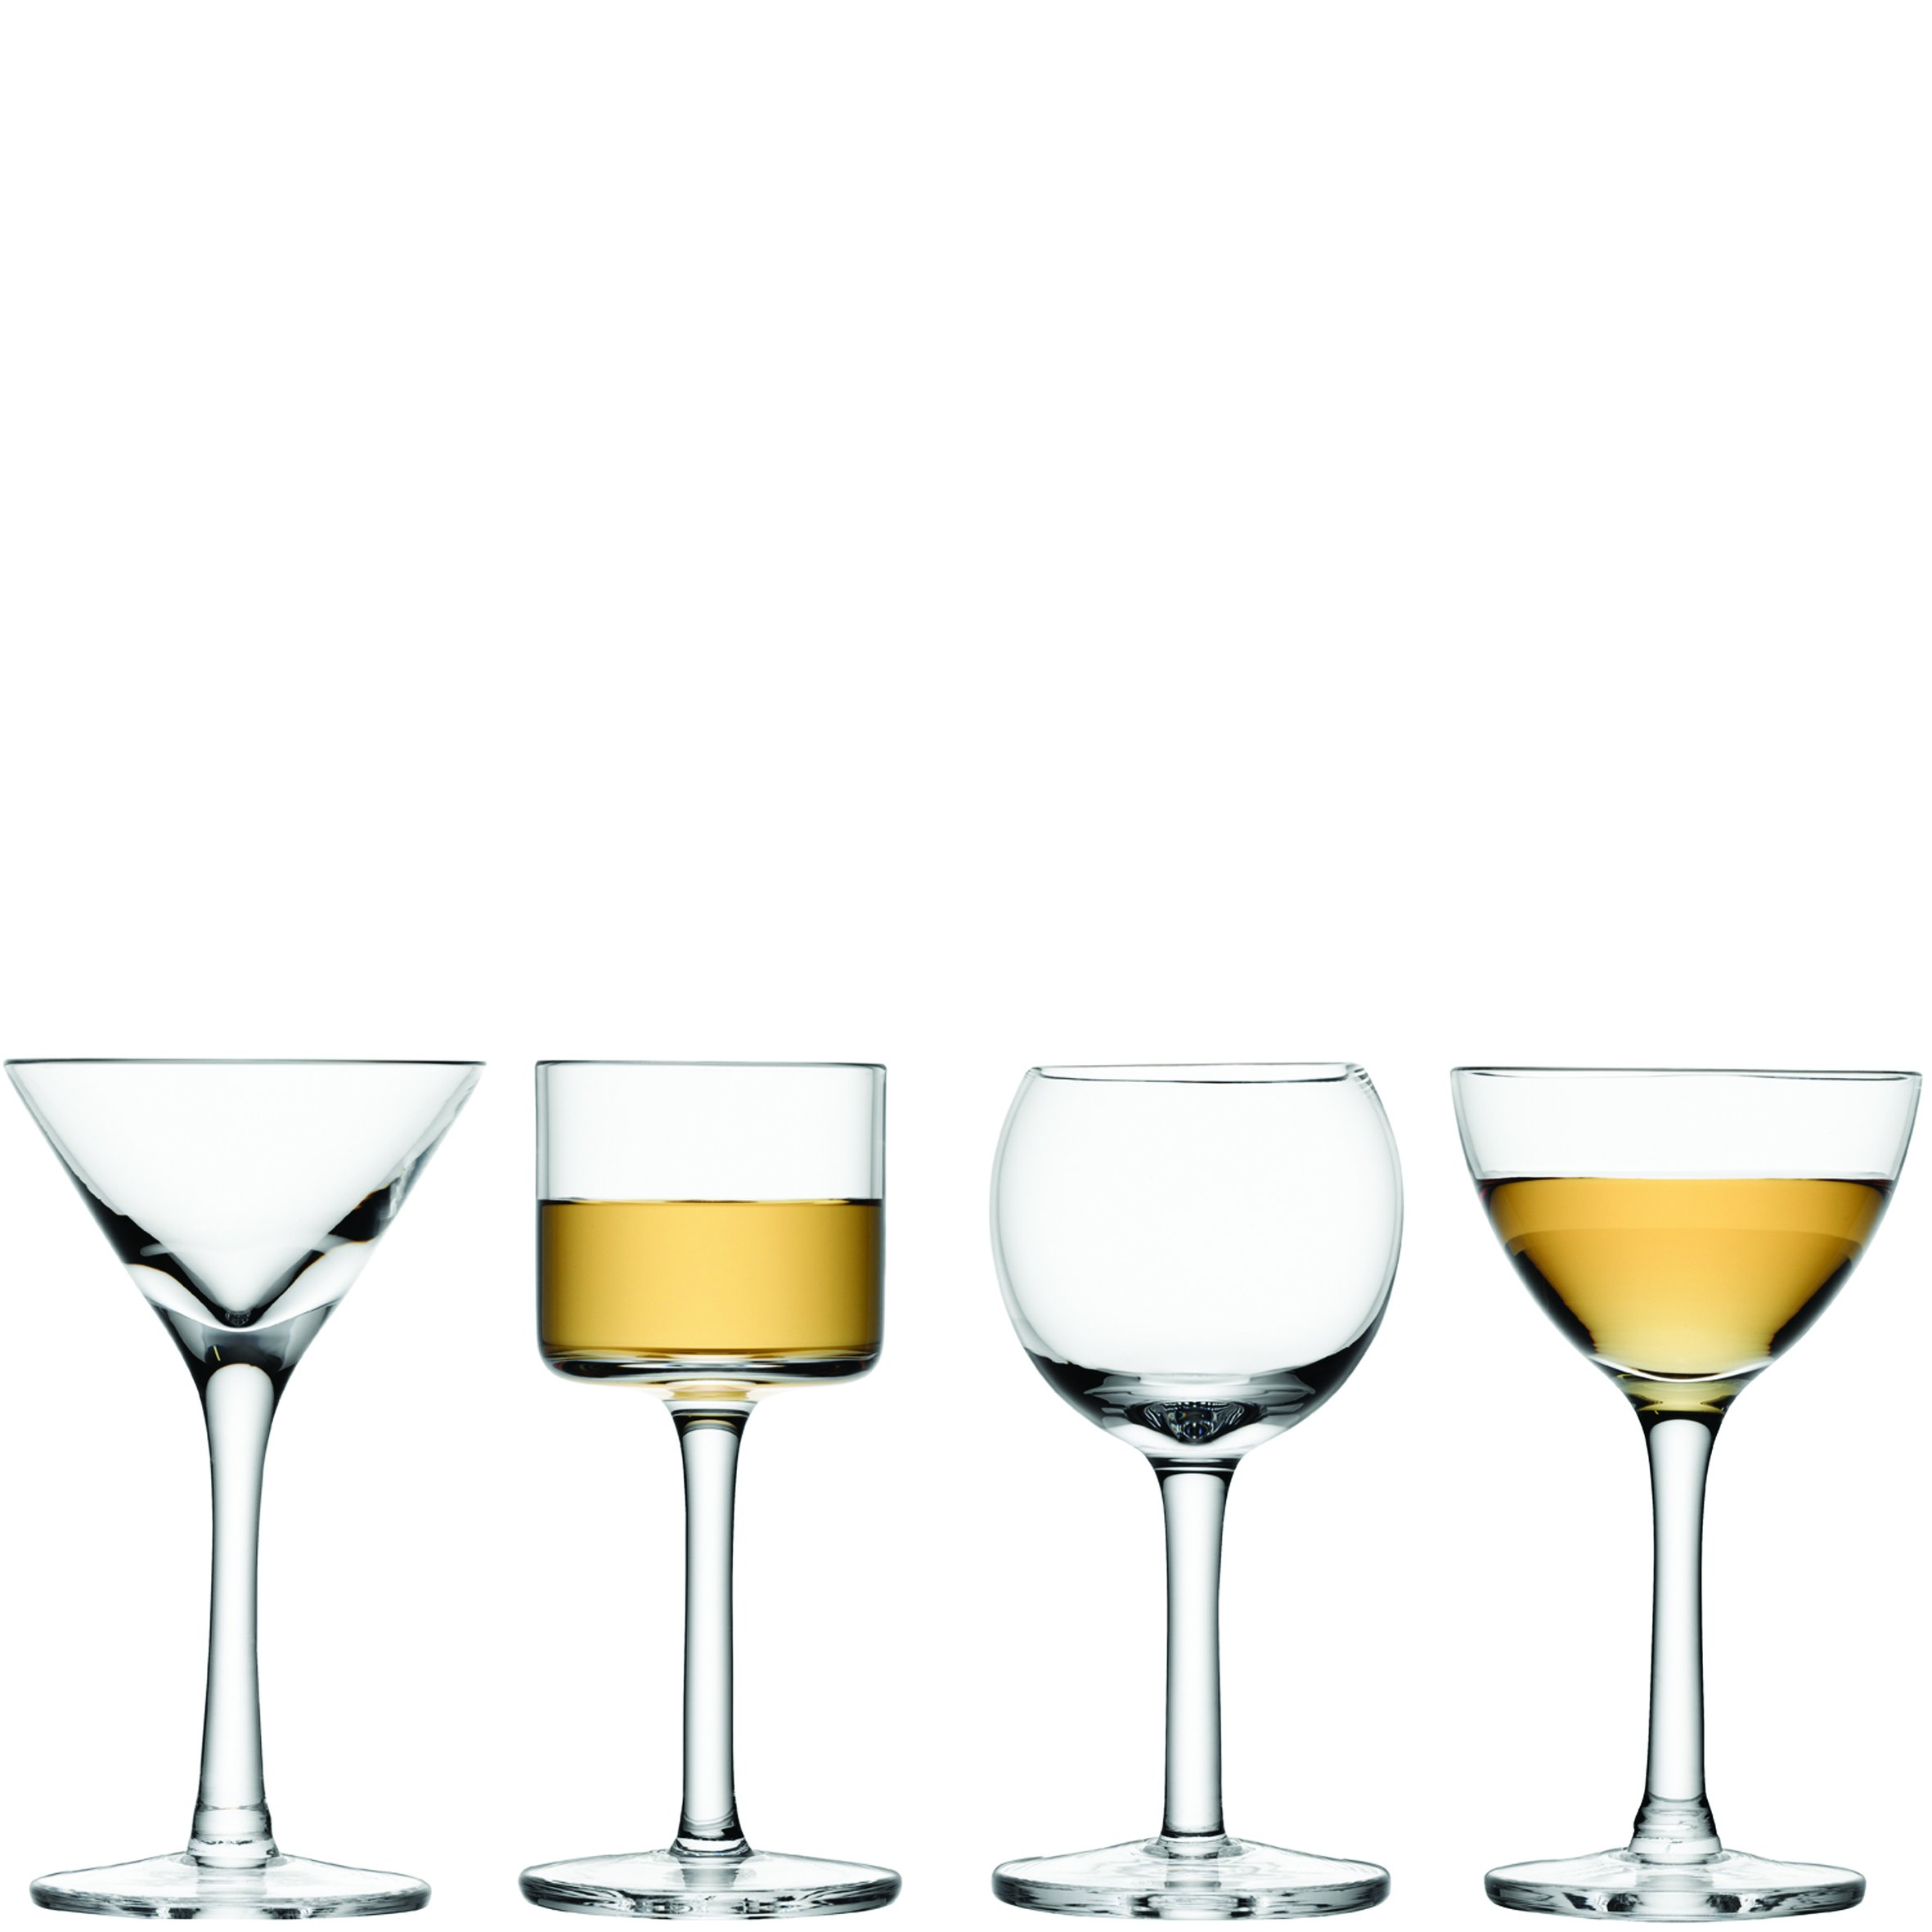 LSA International Assorted Lulu Liqueur Glass (4 Pack), 1.7 - 1.8 fl. oz., Clear by LSA International